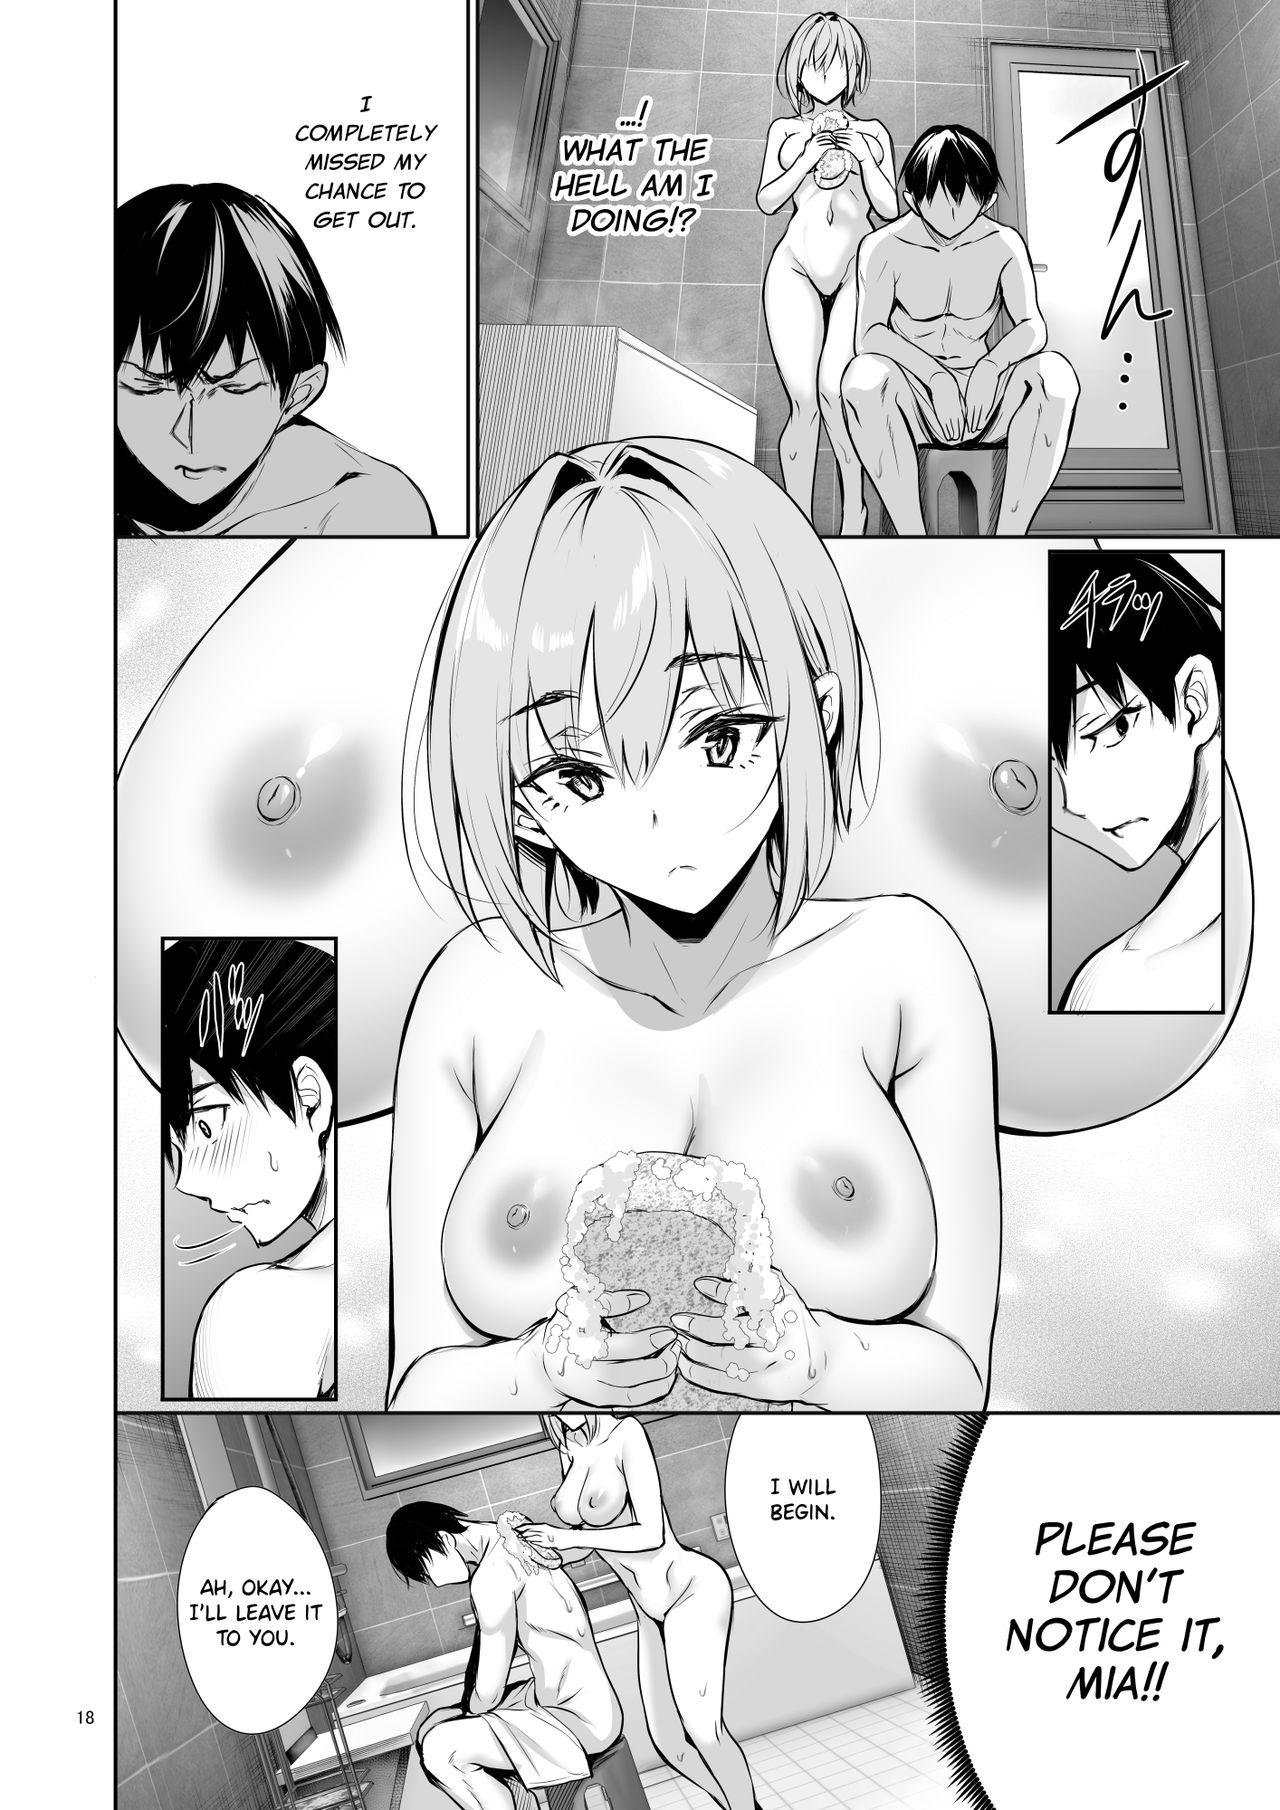 Homestay-chu no Doitsu Musume ga Issho ni Furo ni Haitte Kuru Wake | The Reason Why a German Girl Takes a Bath Together With Me on Her Homestay 17